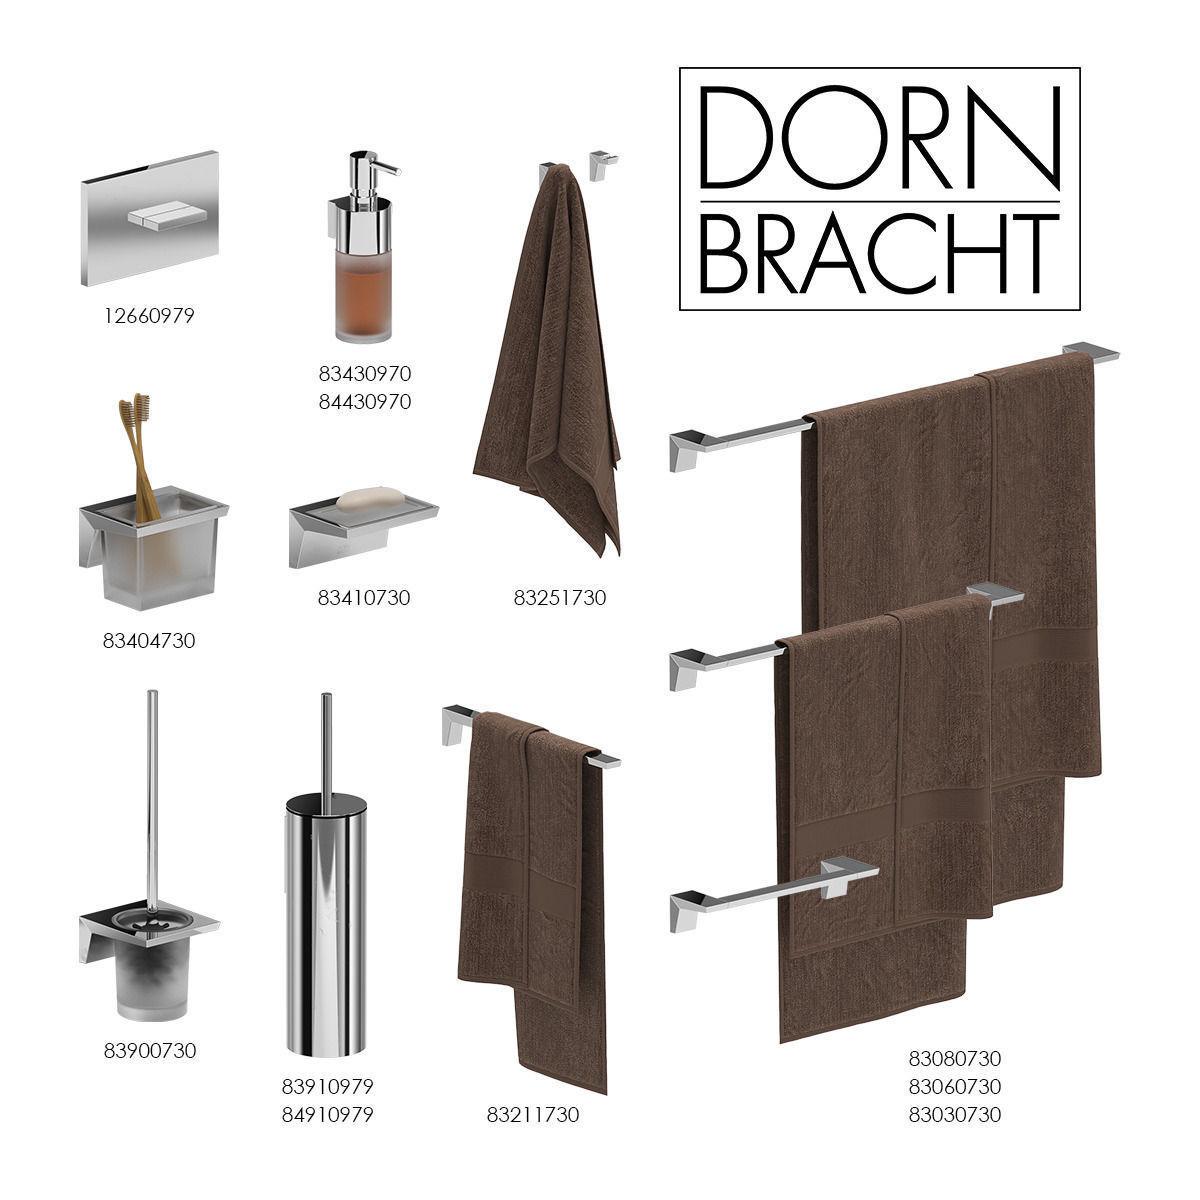 Dornbracht 3D Models | CGTrader